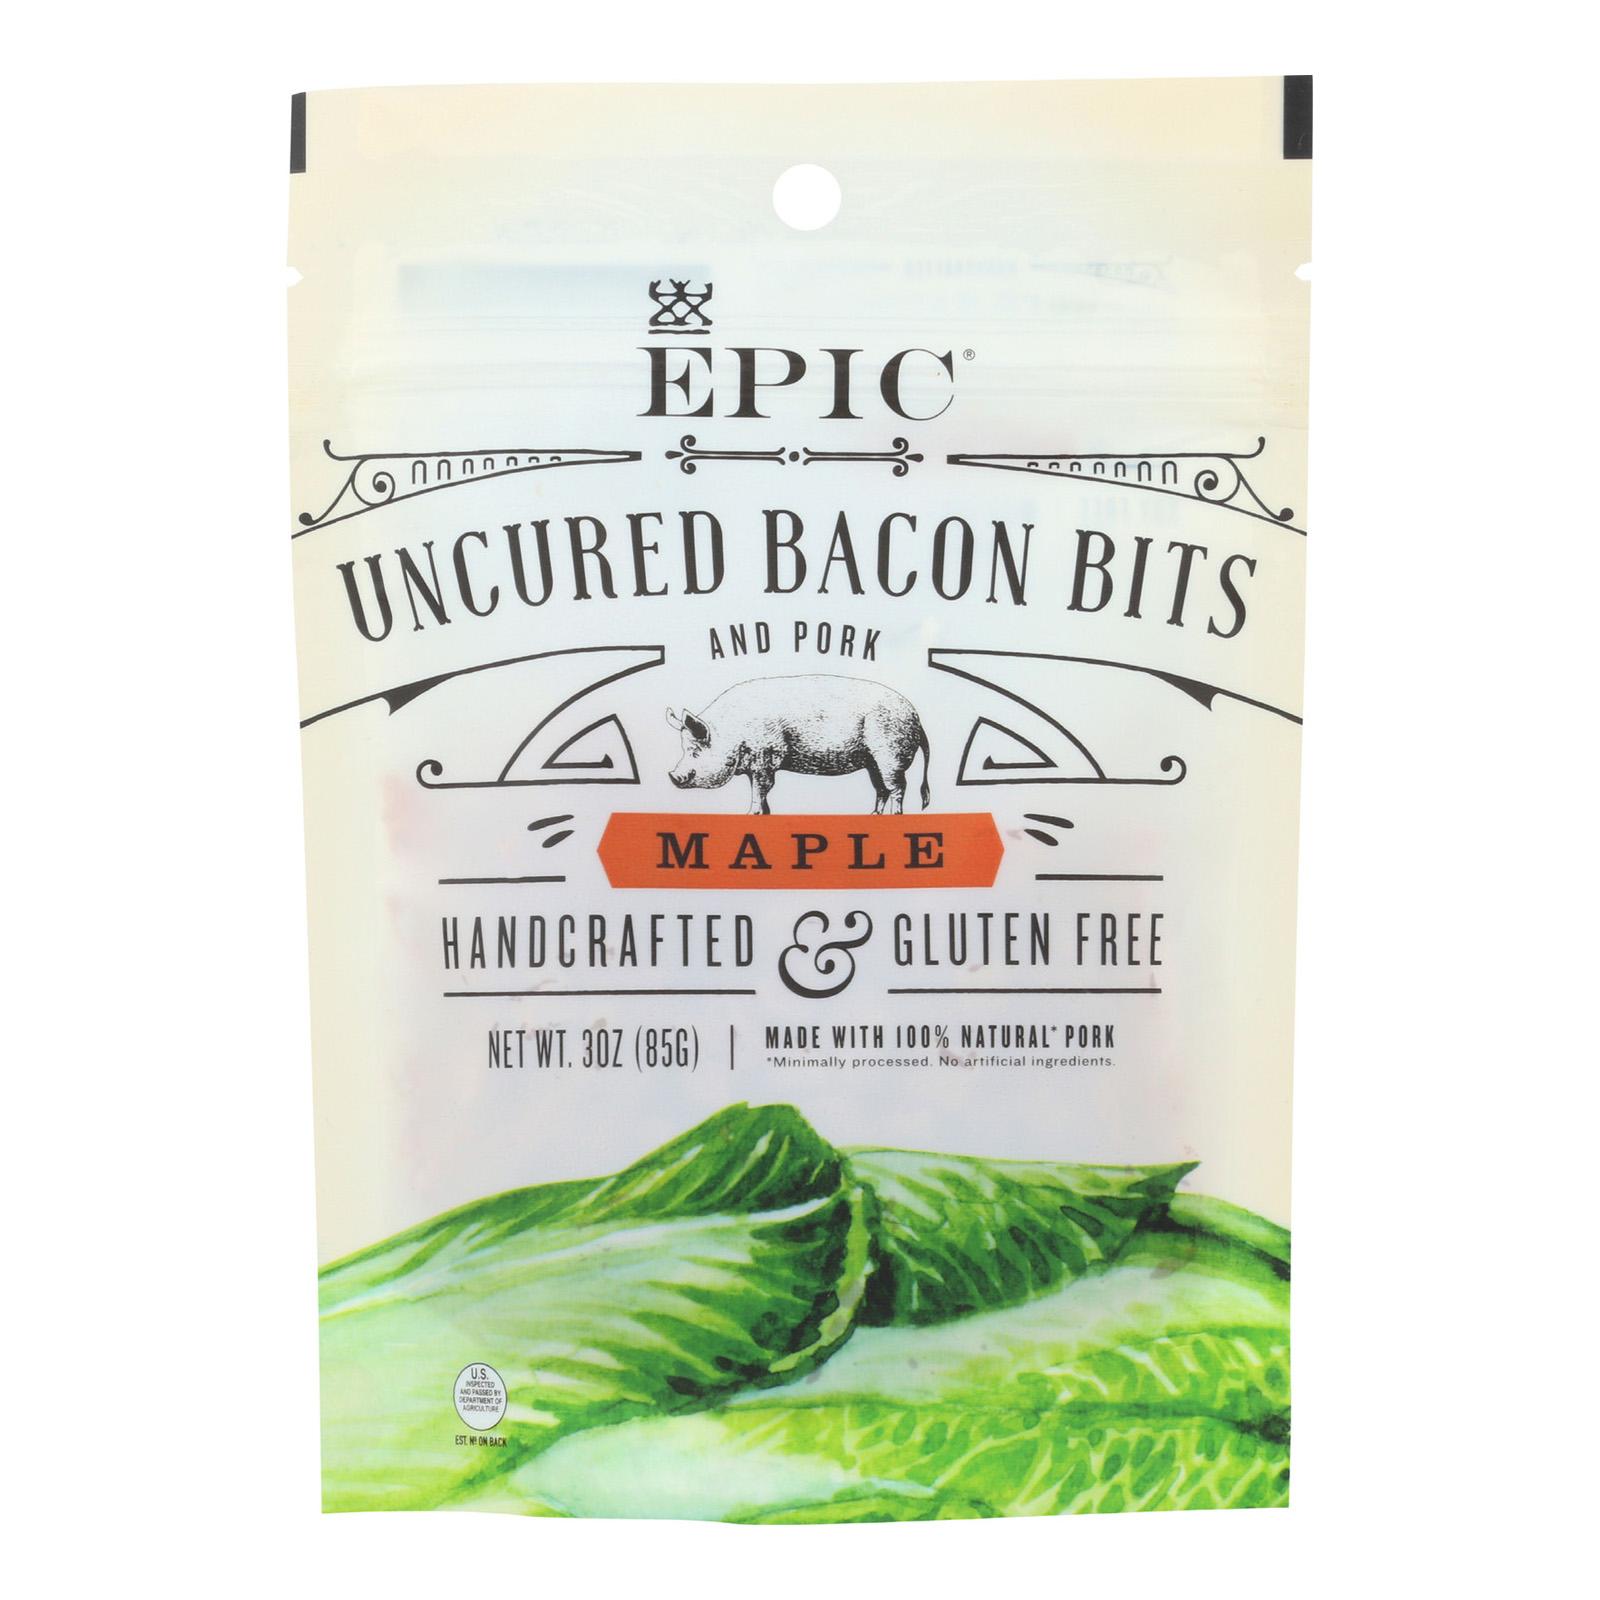 Epic Uncured Bacon Bits - Maple - Case Of 10 - 3 Oz.